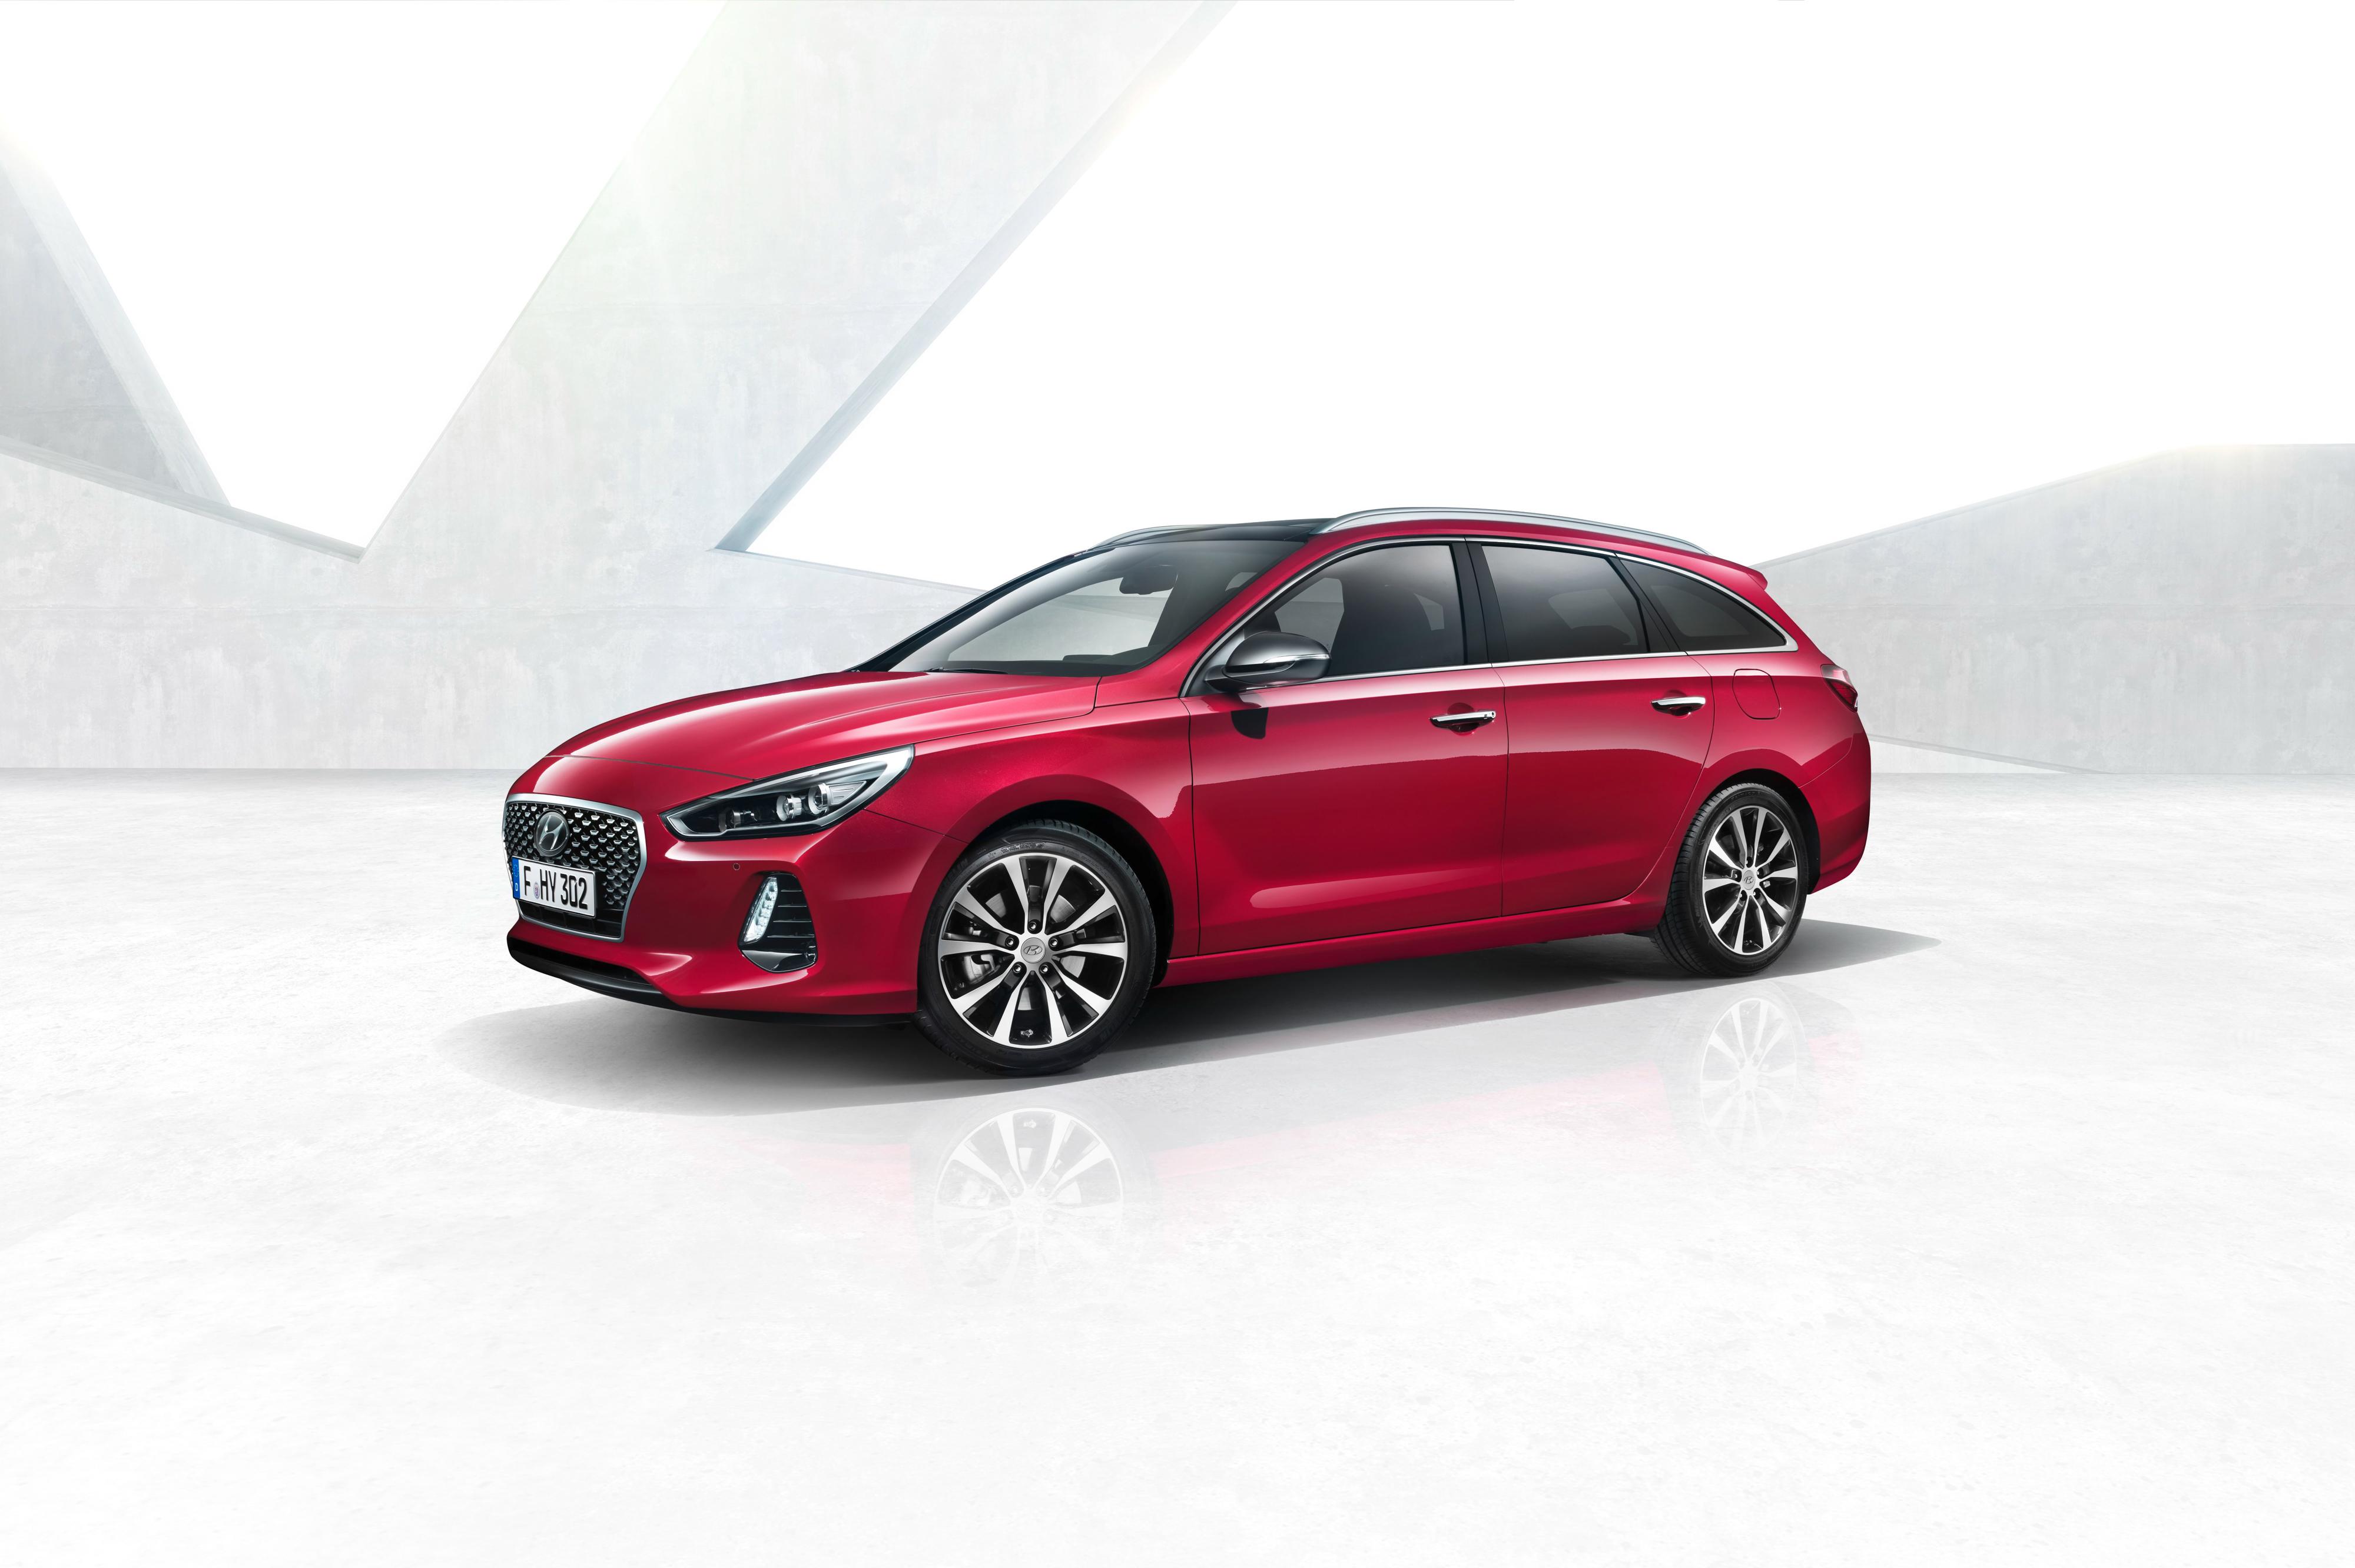 Next Generation Hyundai i30 Wagon: world premiere at the 2017 Geneva International Motor Show